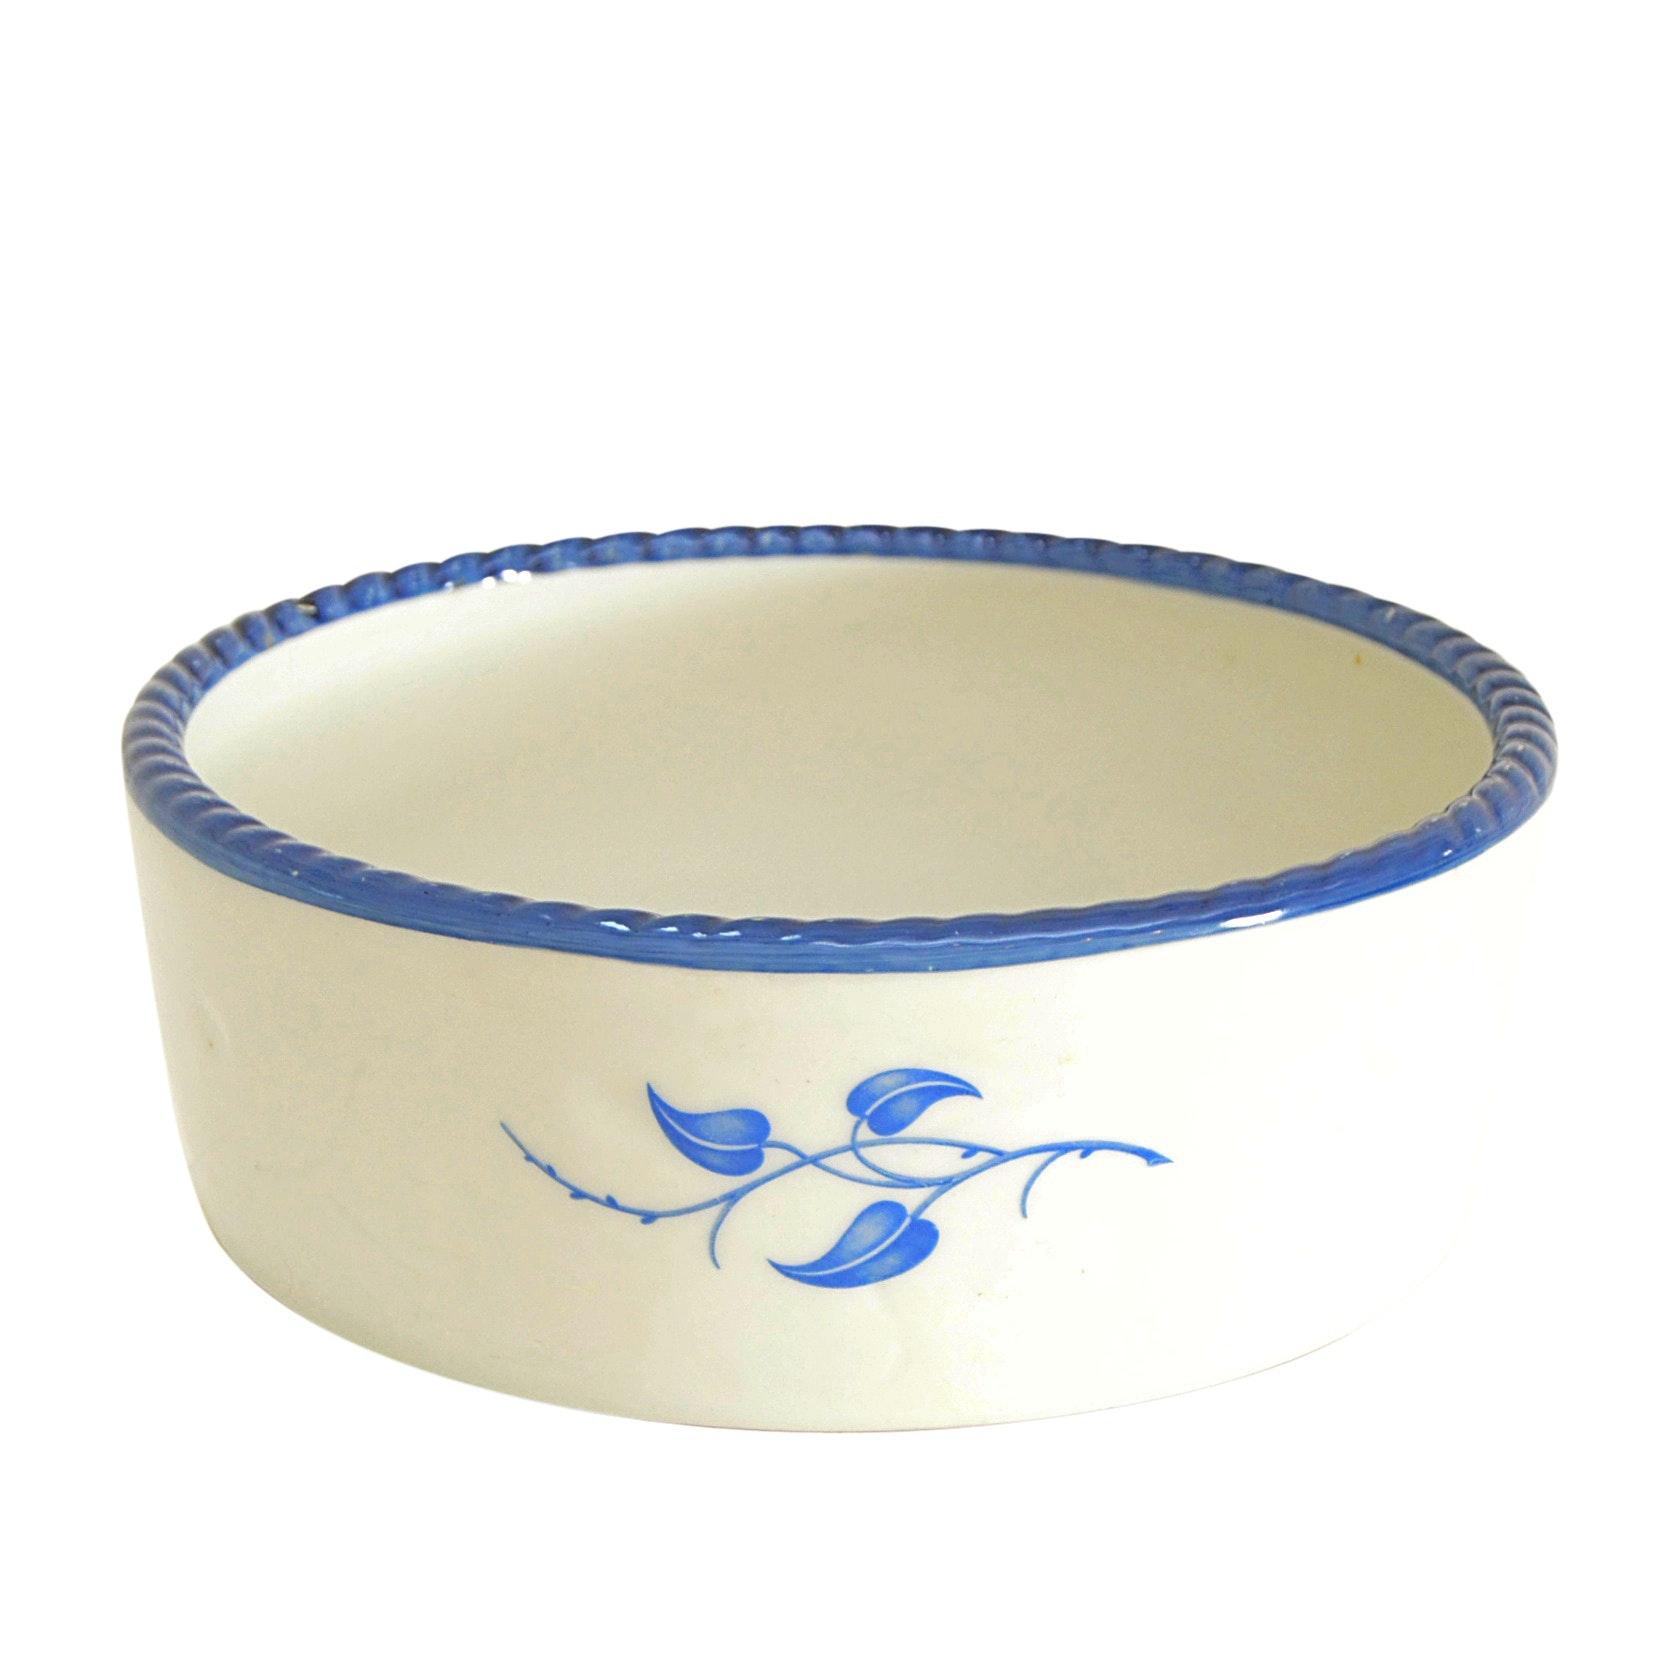 Rosenthal Porcelain Bowl